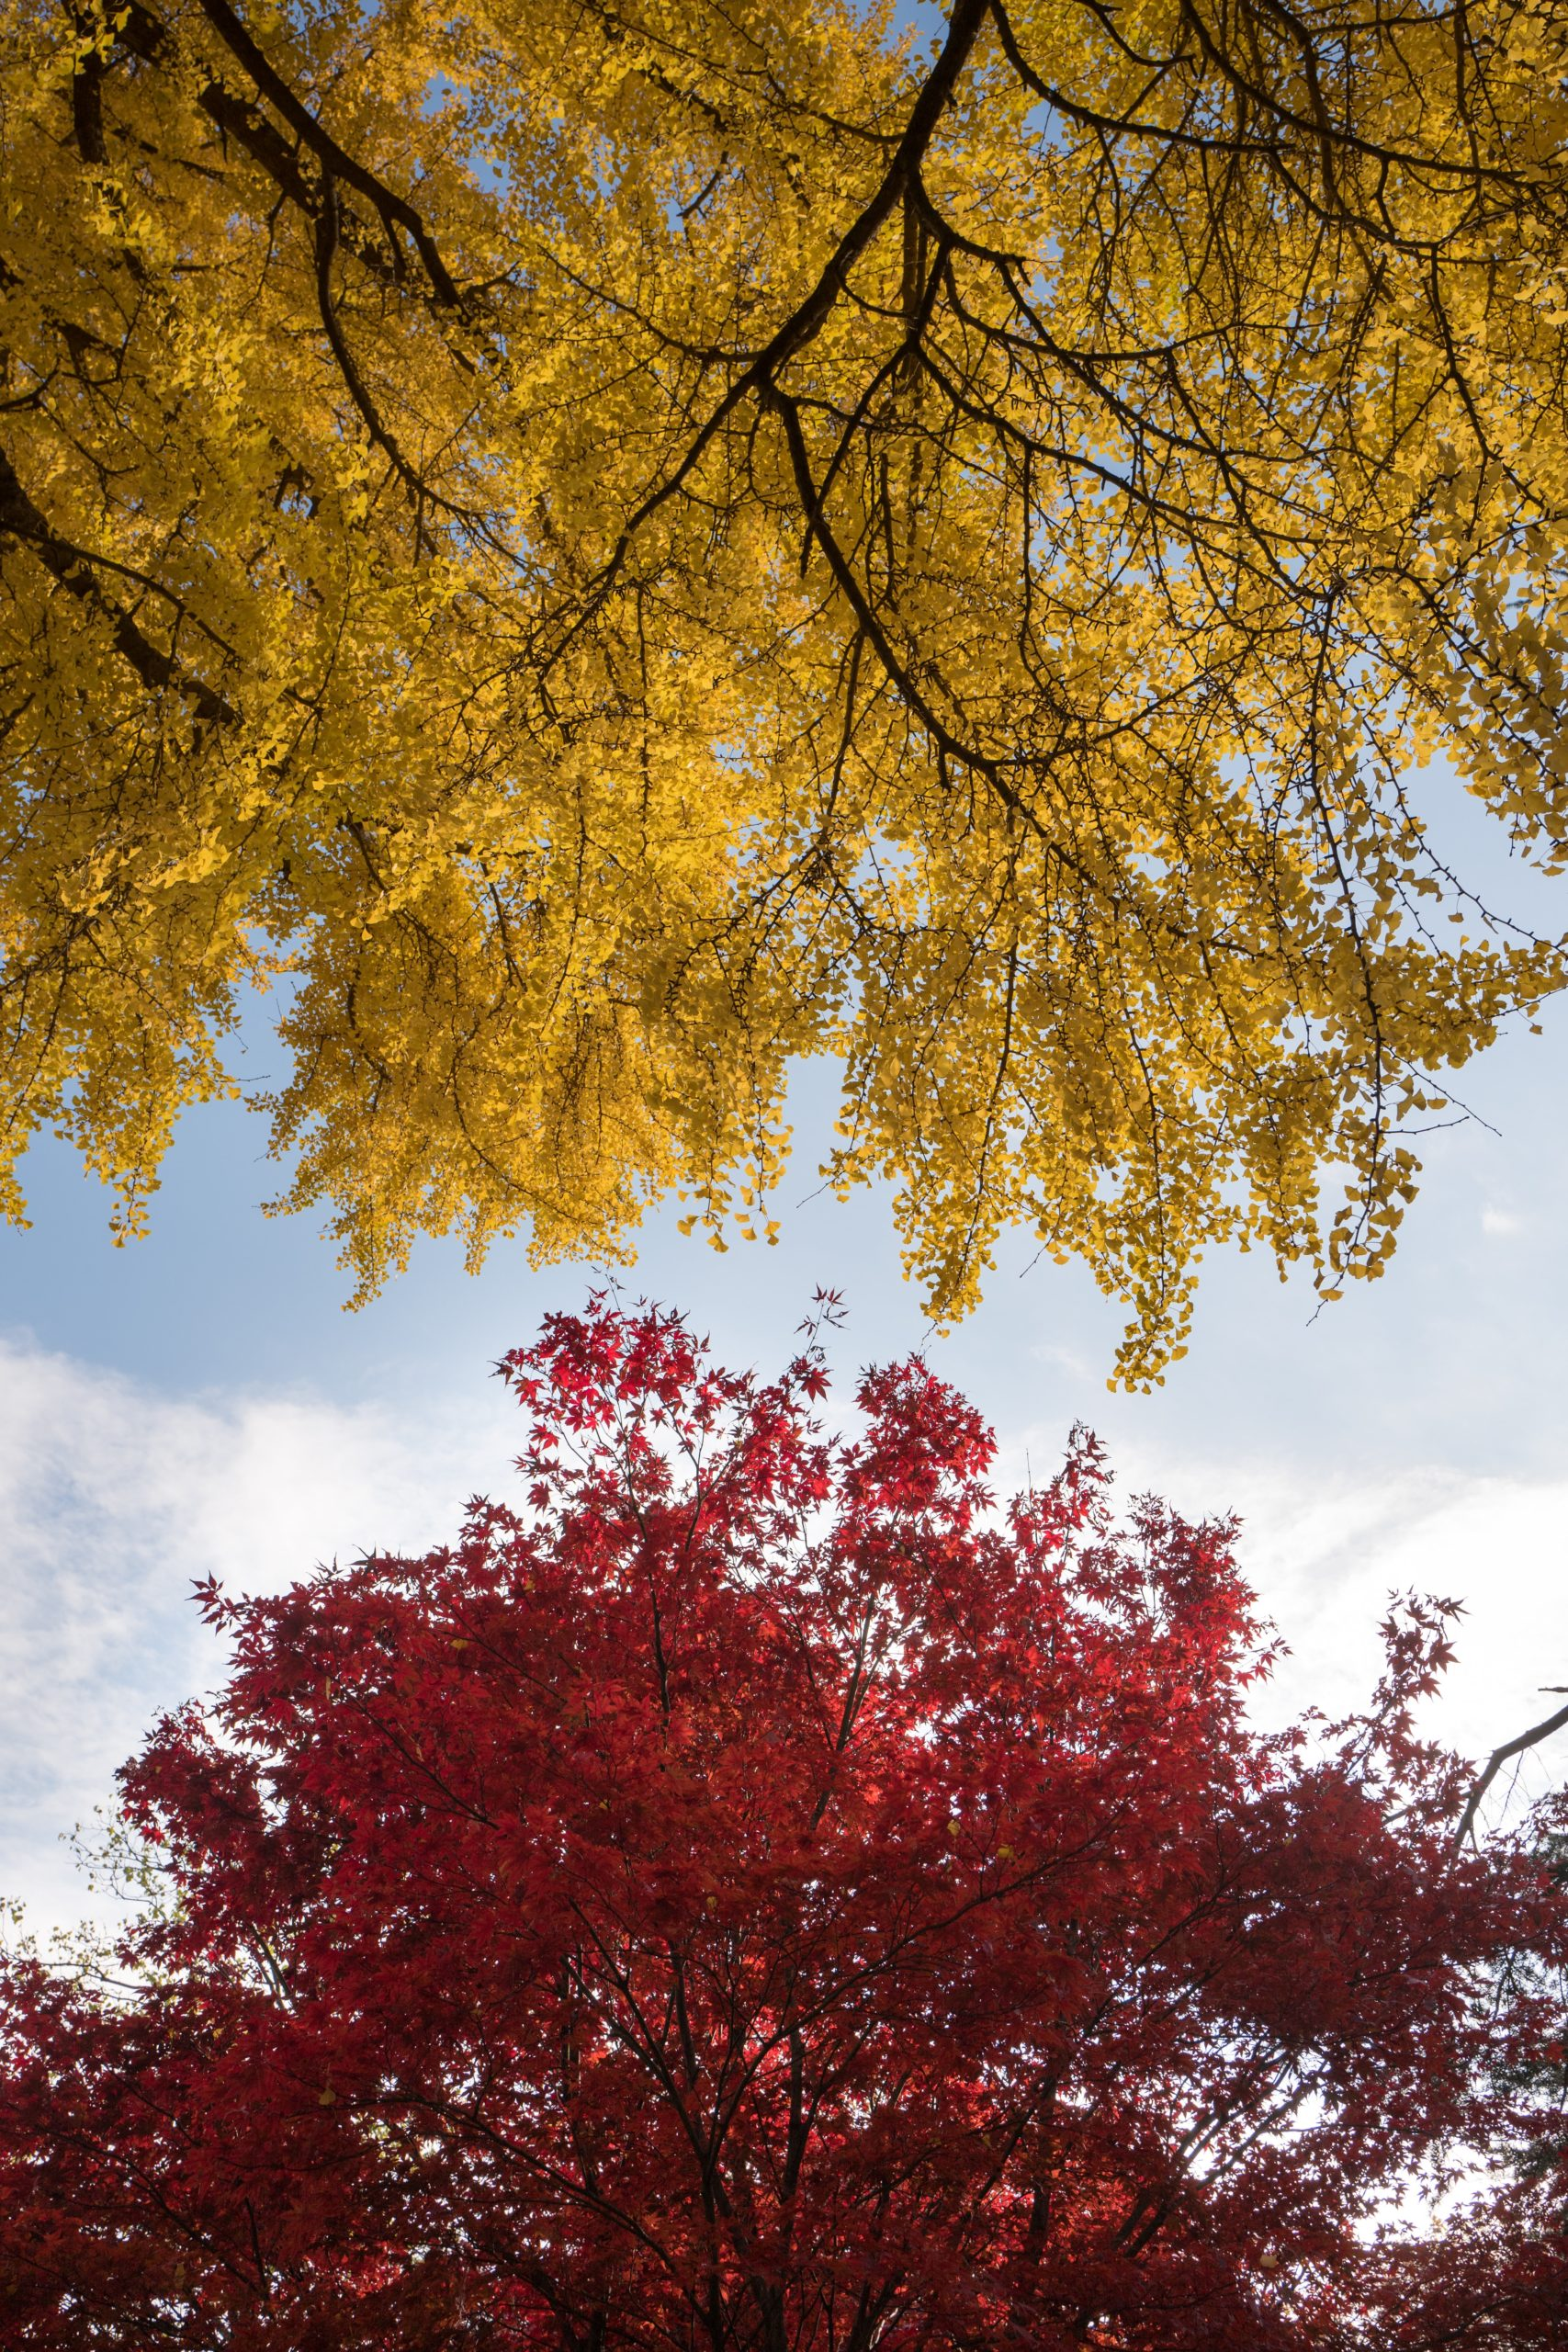 Zwei bunte Herbstbäume